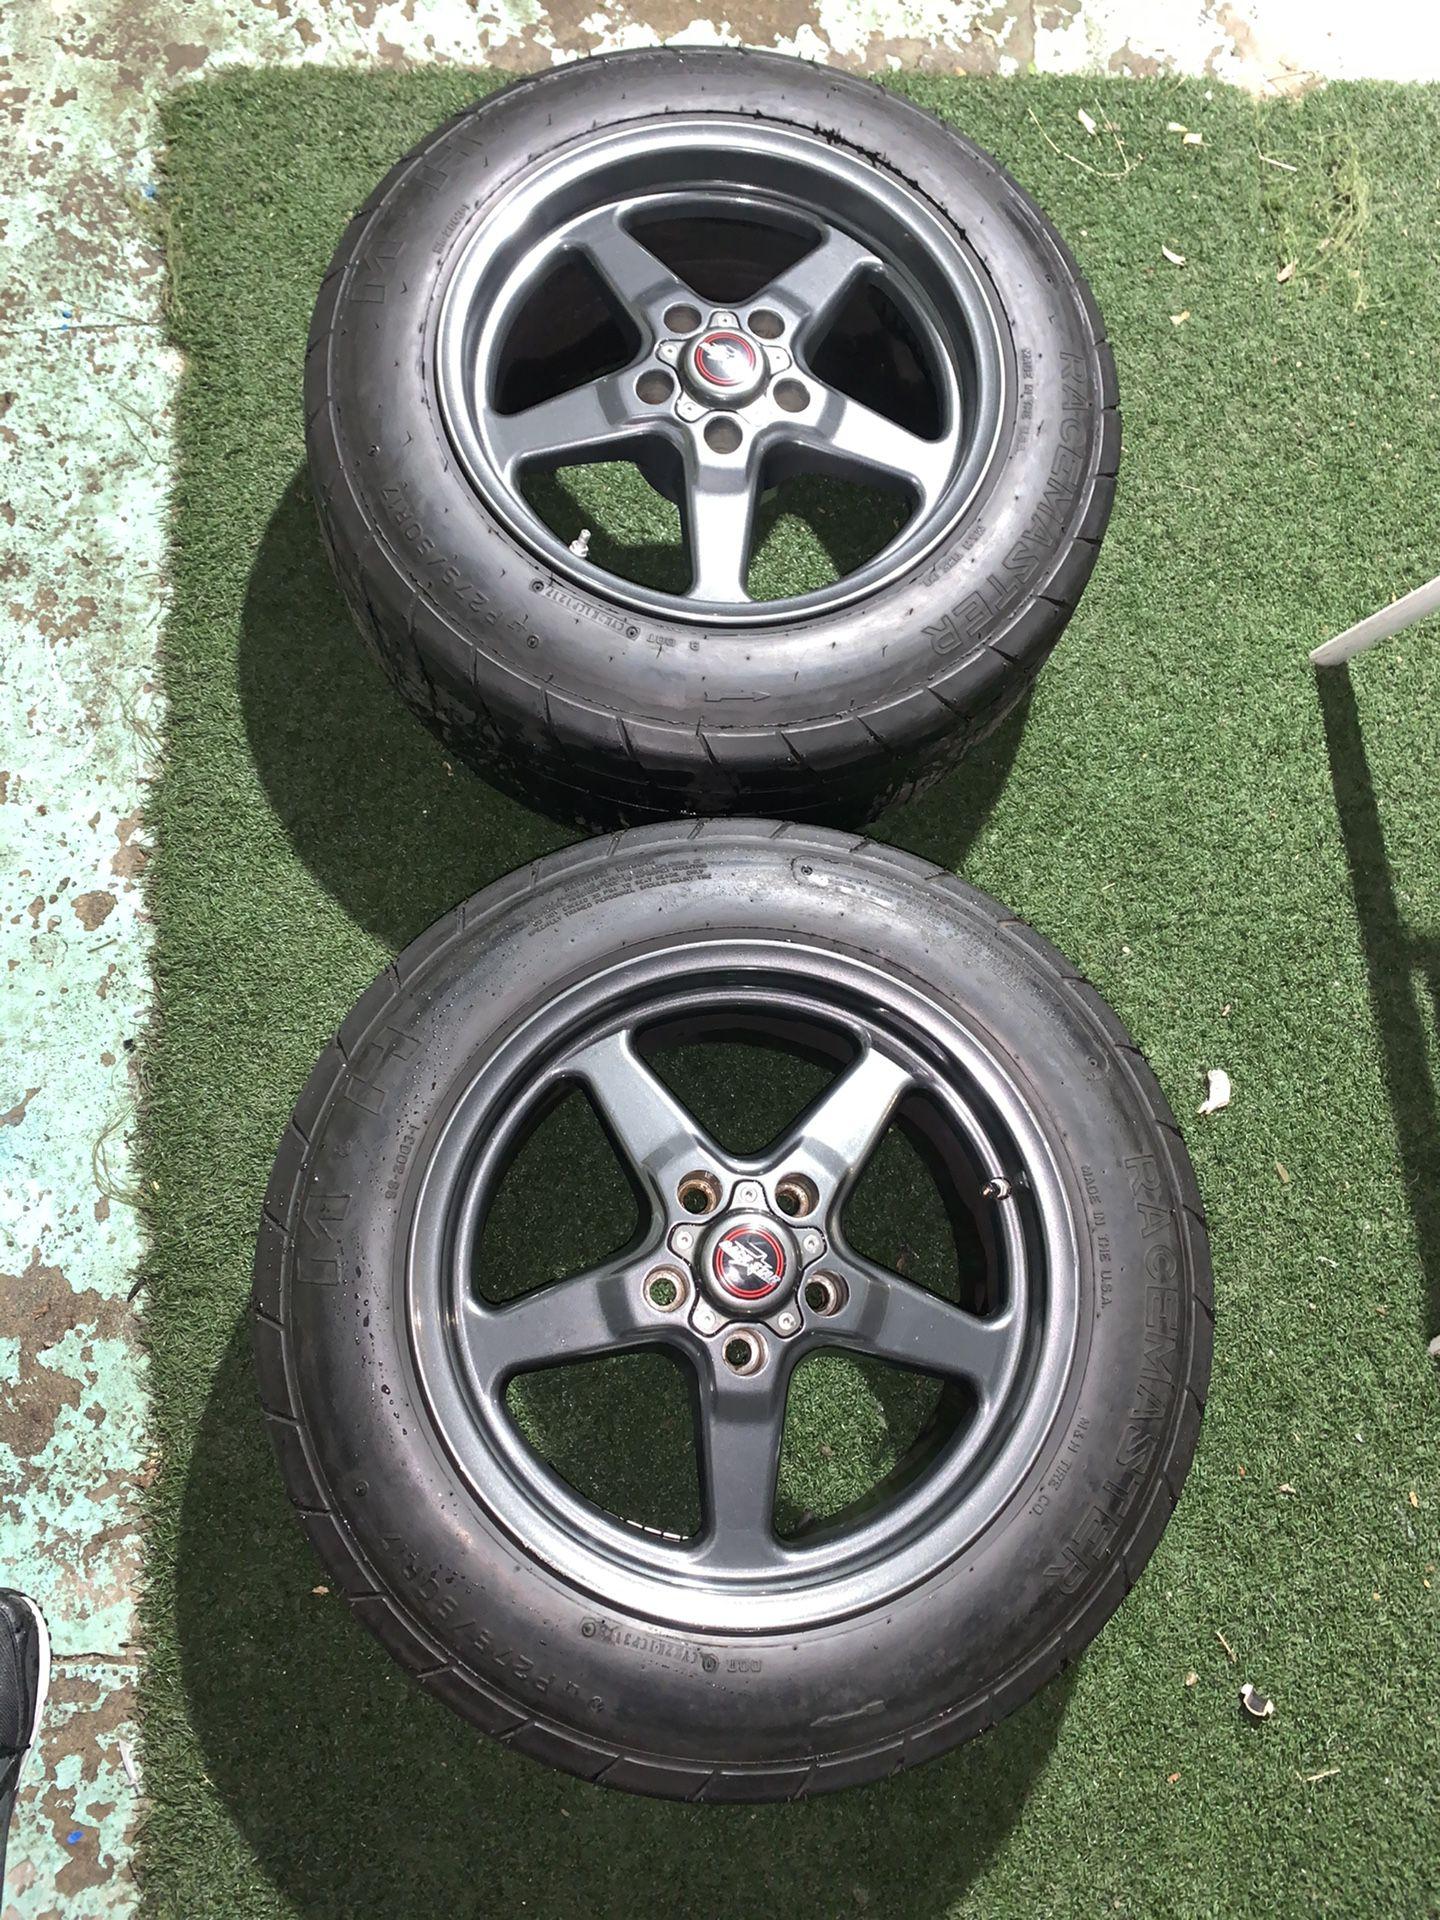 Photo Race Star Dark Star Drag Pack Rims Wheels Tires 5x120 17x10.5 ET 35 17x4.5 25.4 Mickey Thompson MH Racemaster Camaro SS Zl1 CTS V Corvette C5 C6 GM